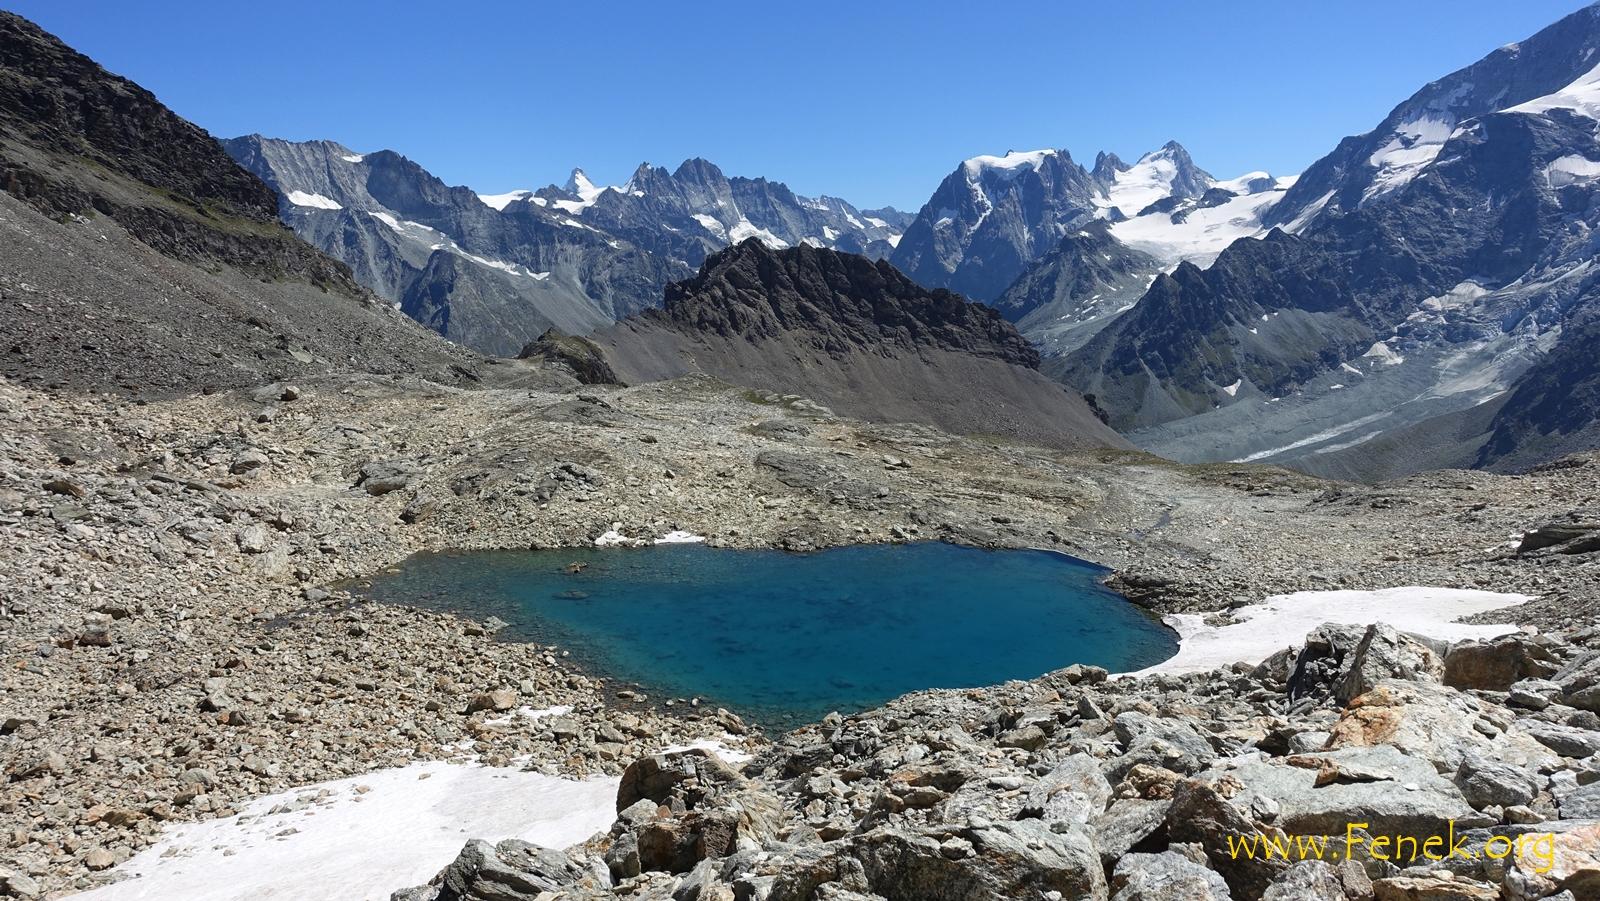 Bergsee bei 2900m